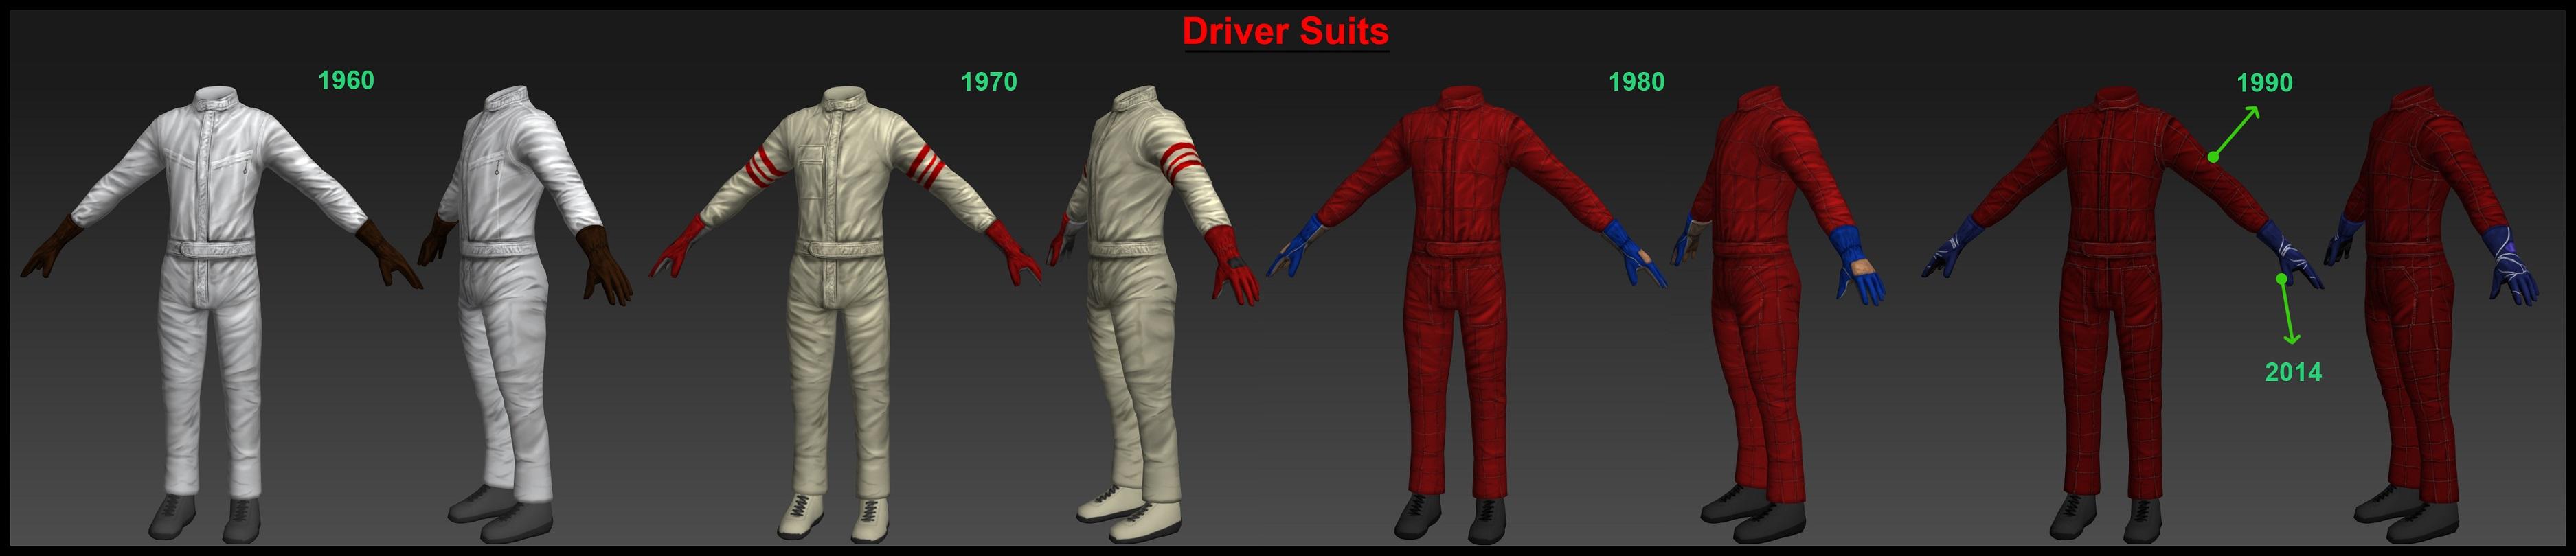 AMS Driver Suits.jpg